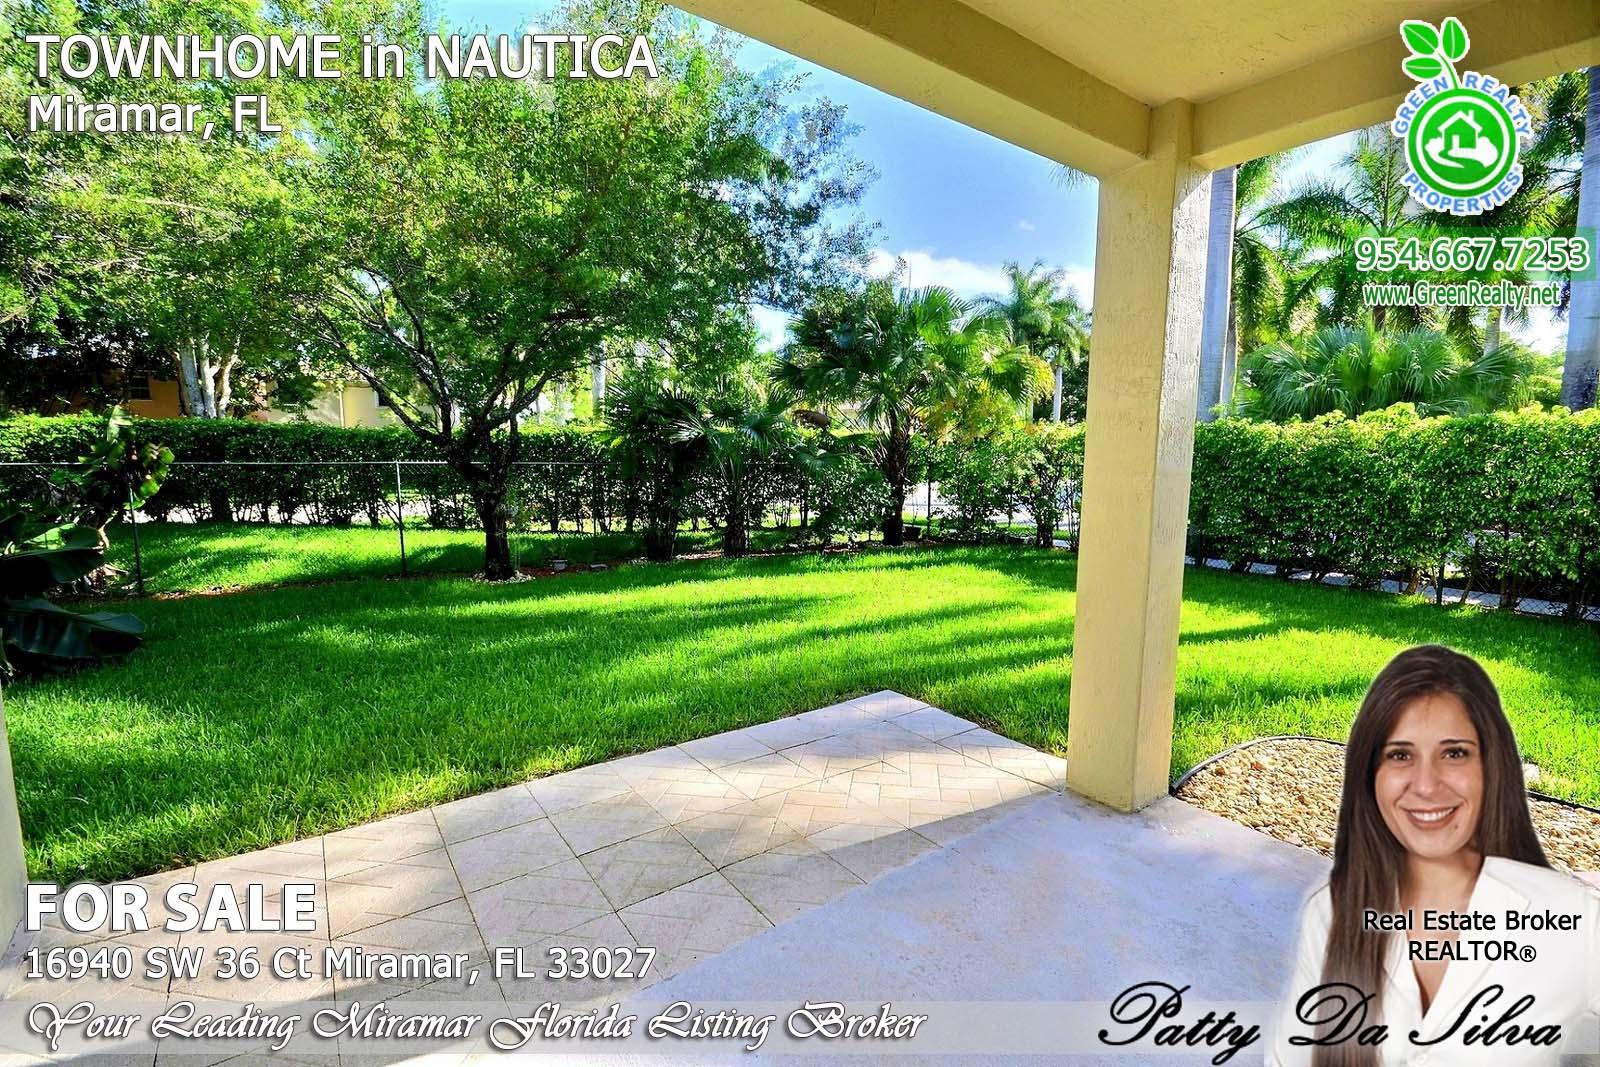 16940 SW 36 Ct Miramar, FL 33027 - Nautica Miramar Homes For Sale (4)